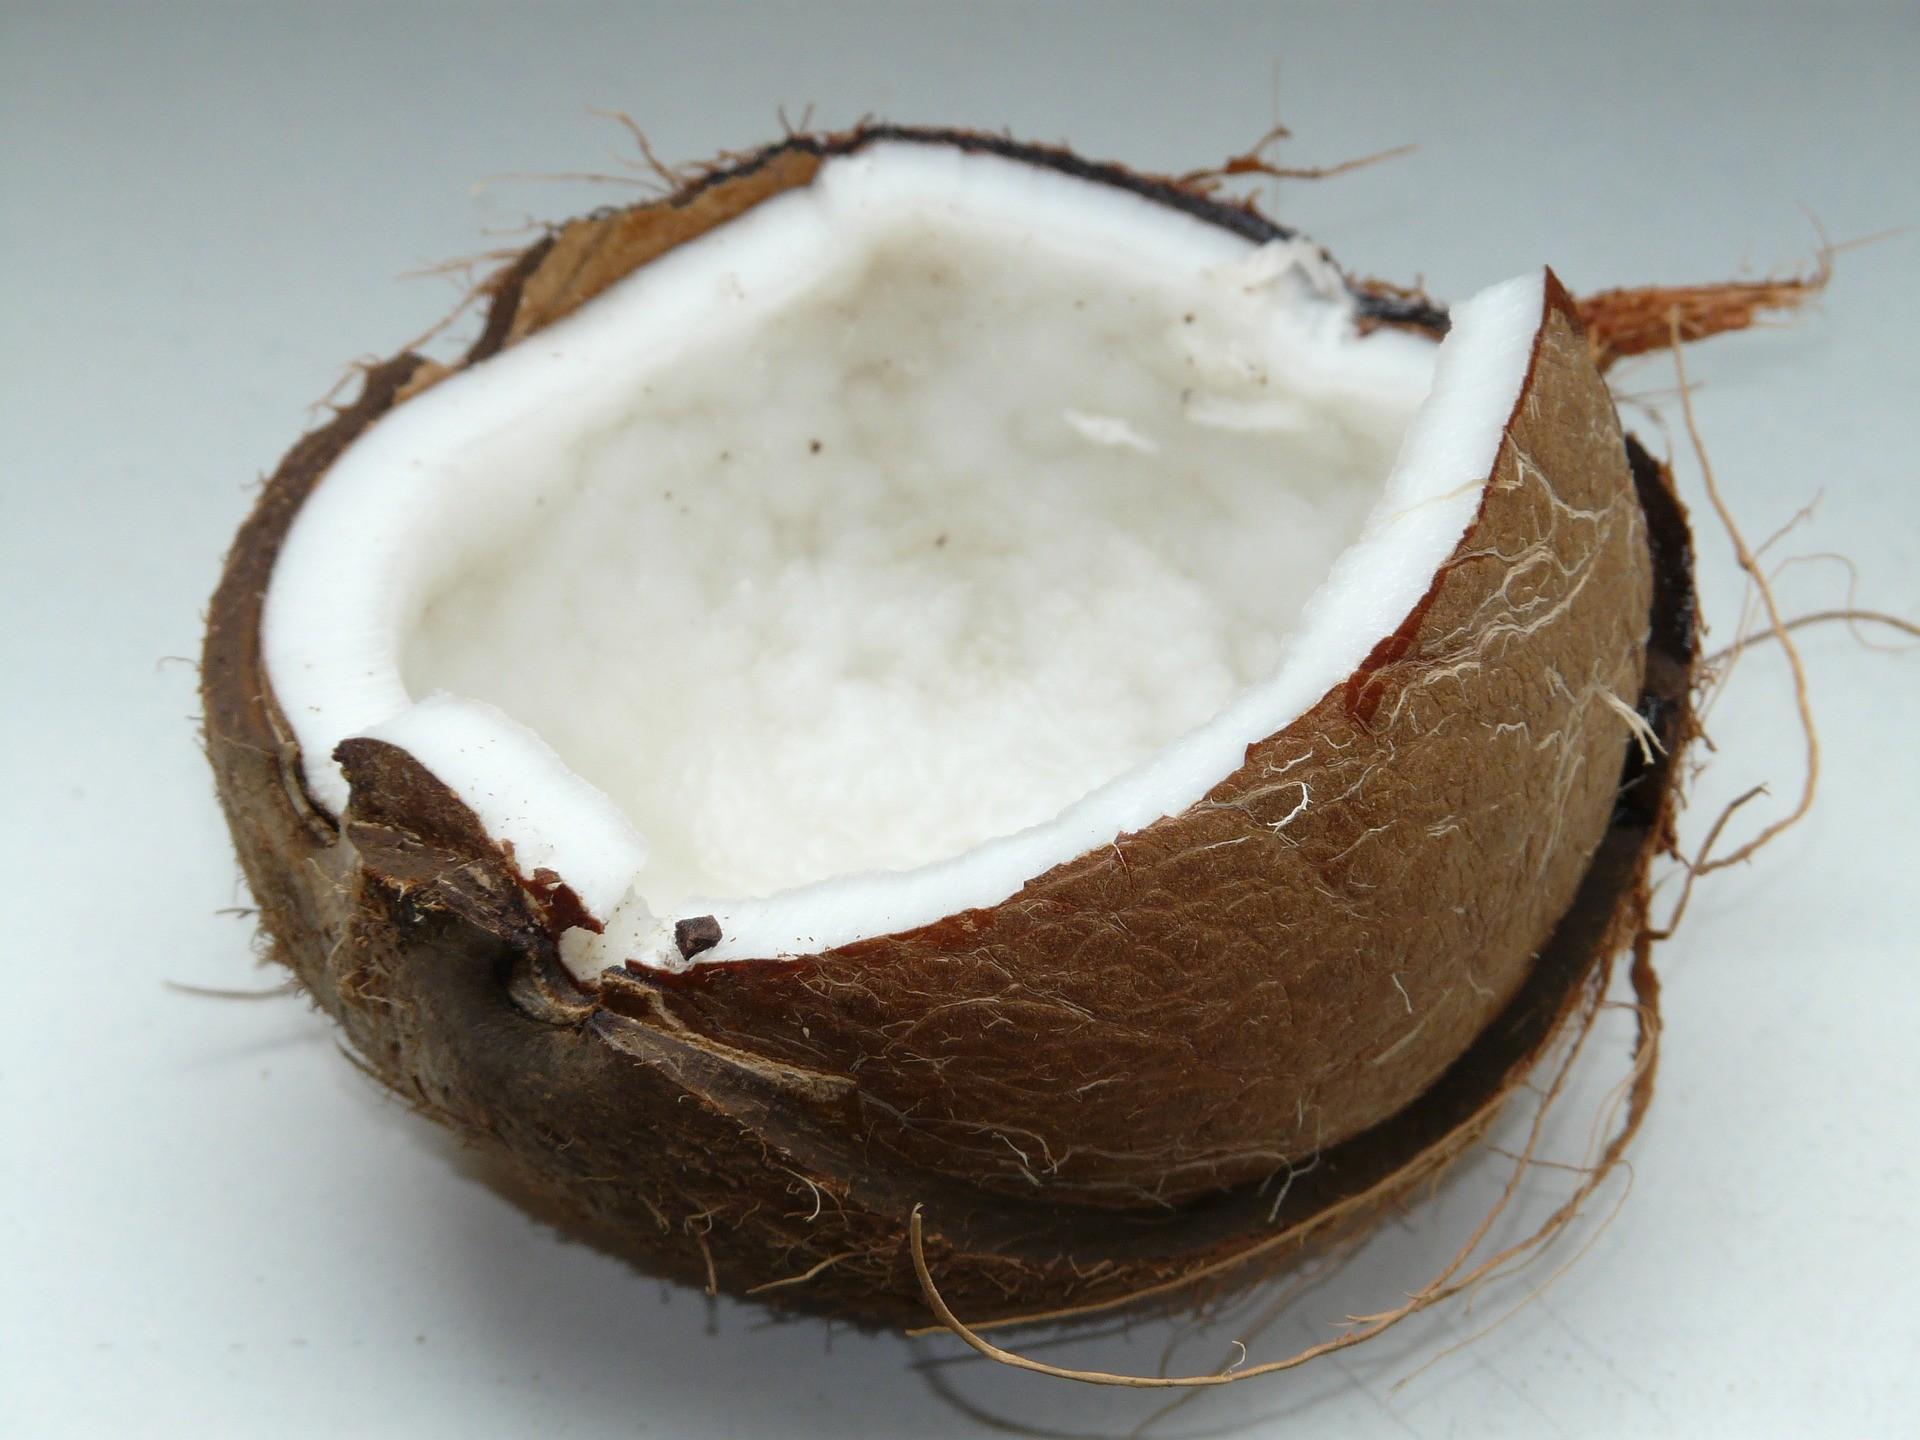 coconut-60395_1920